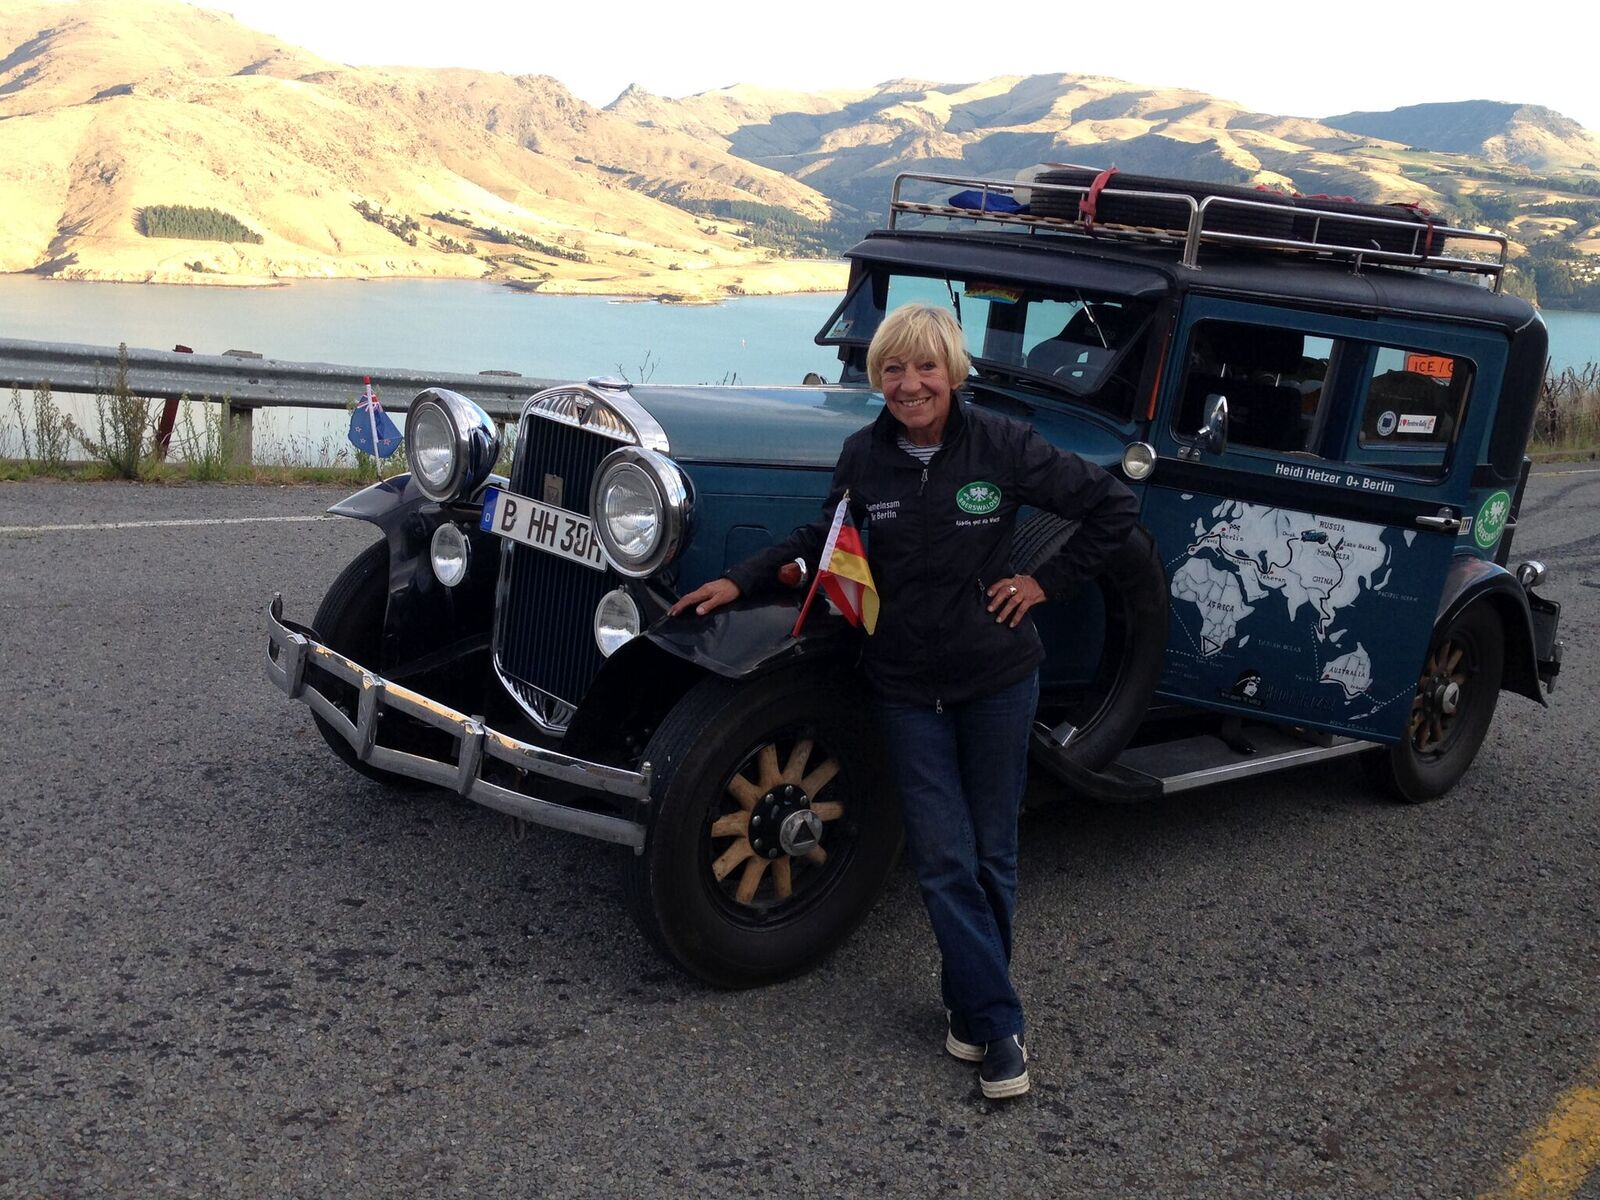 Heidi Hetzer mit Hudo in Neuseeland, ©Heidi Hetzer